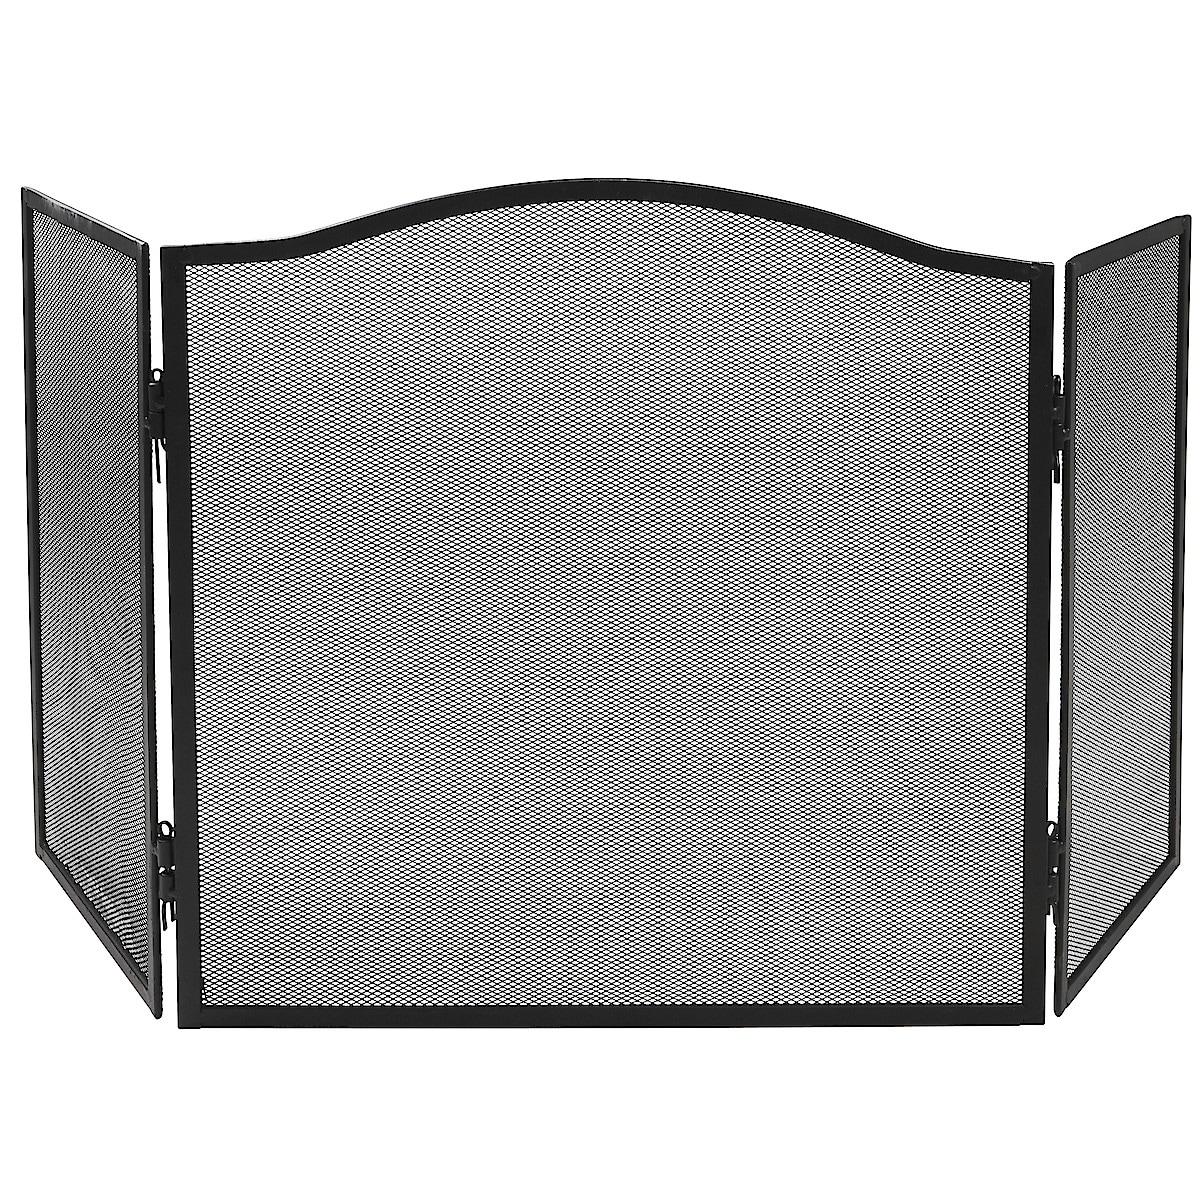 3-Panel Fire Screen